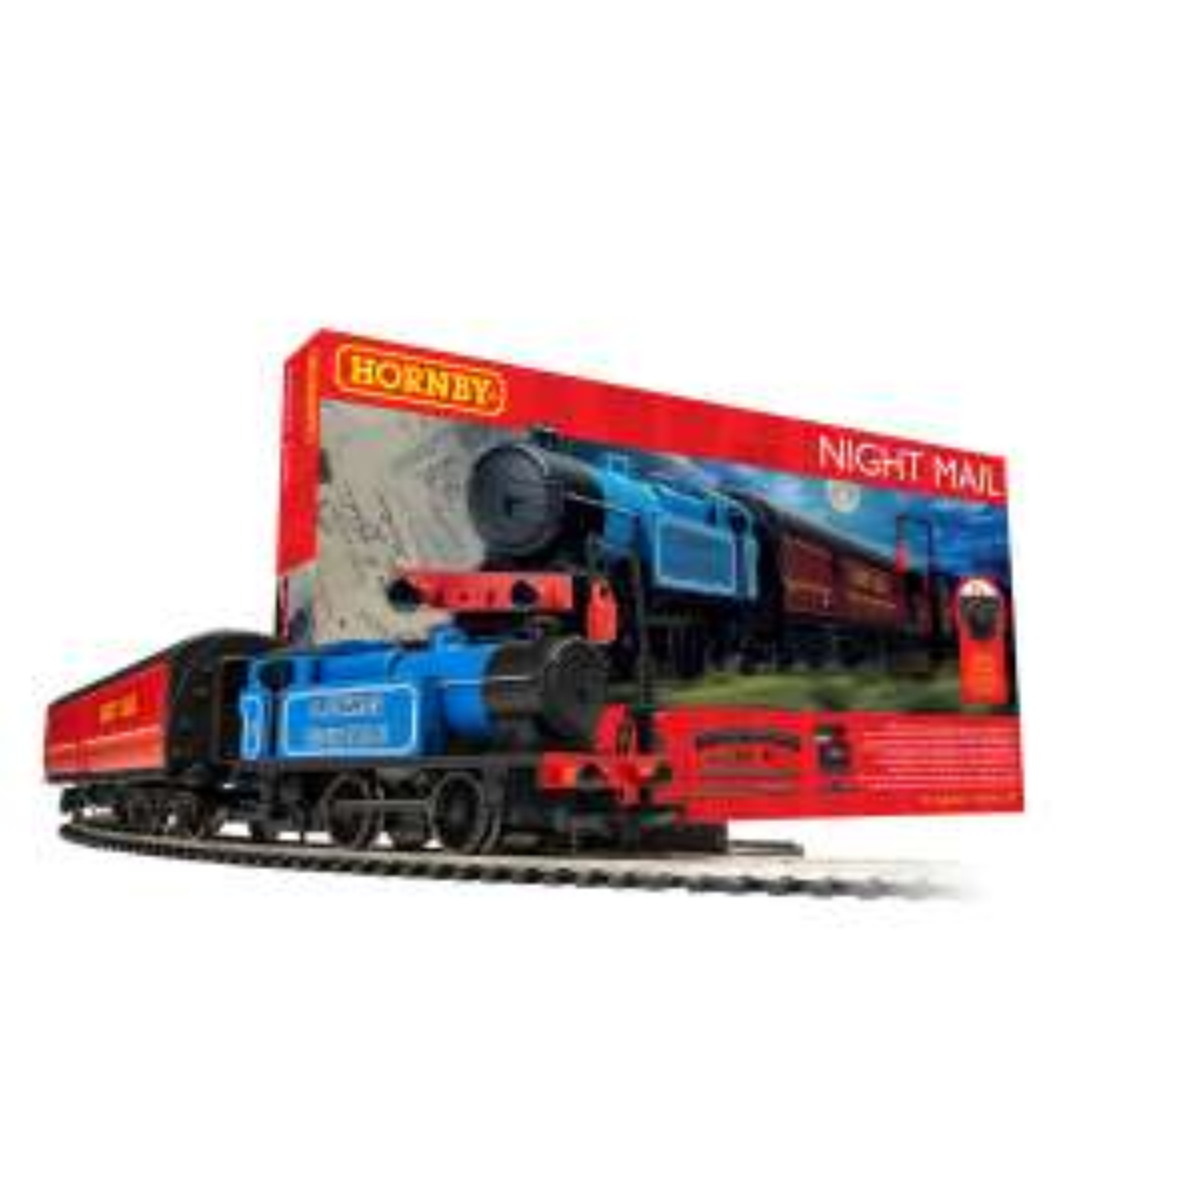 Hornby Night Mail 00 gauge train starter set for £109.99 delivered using code @ The Entertainer